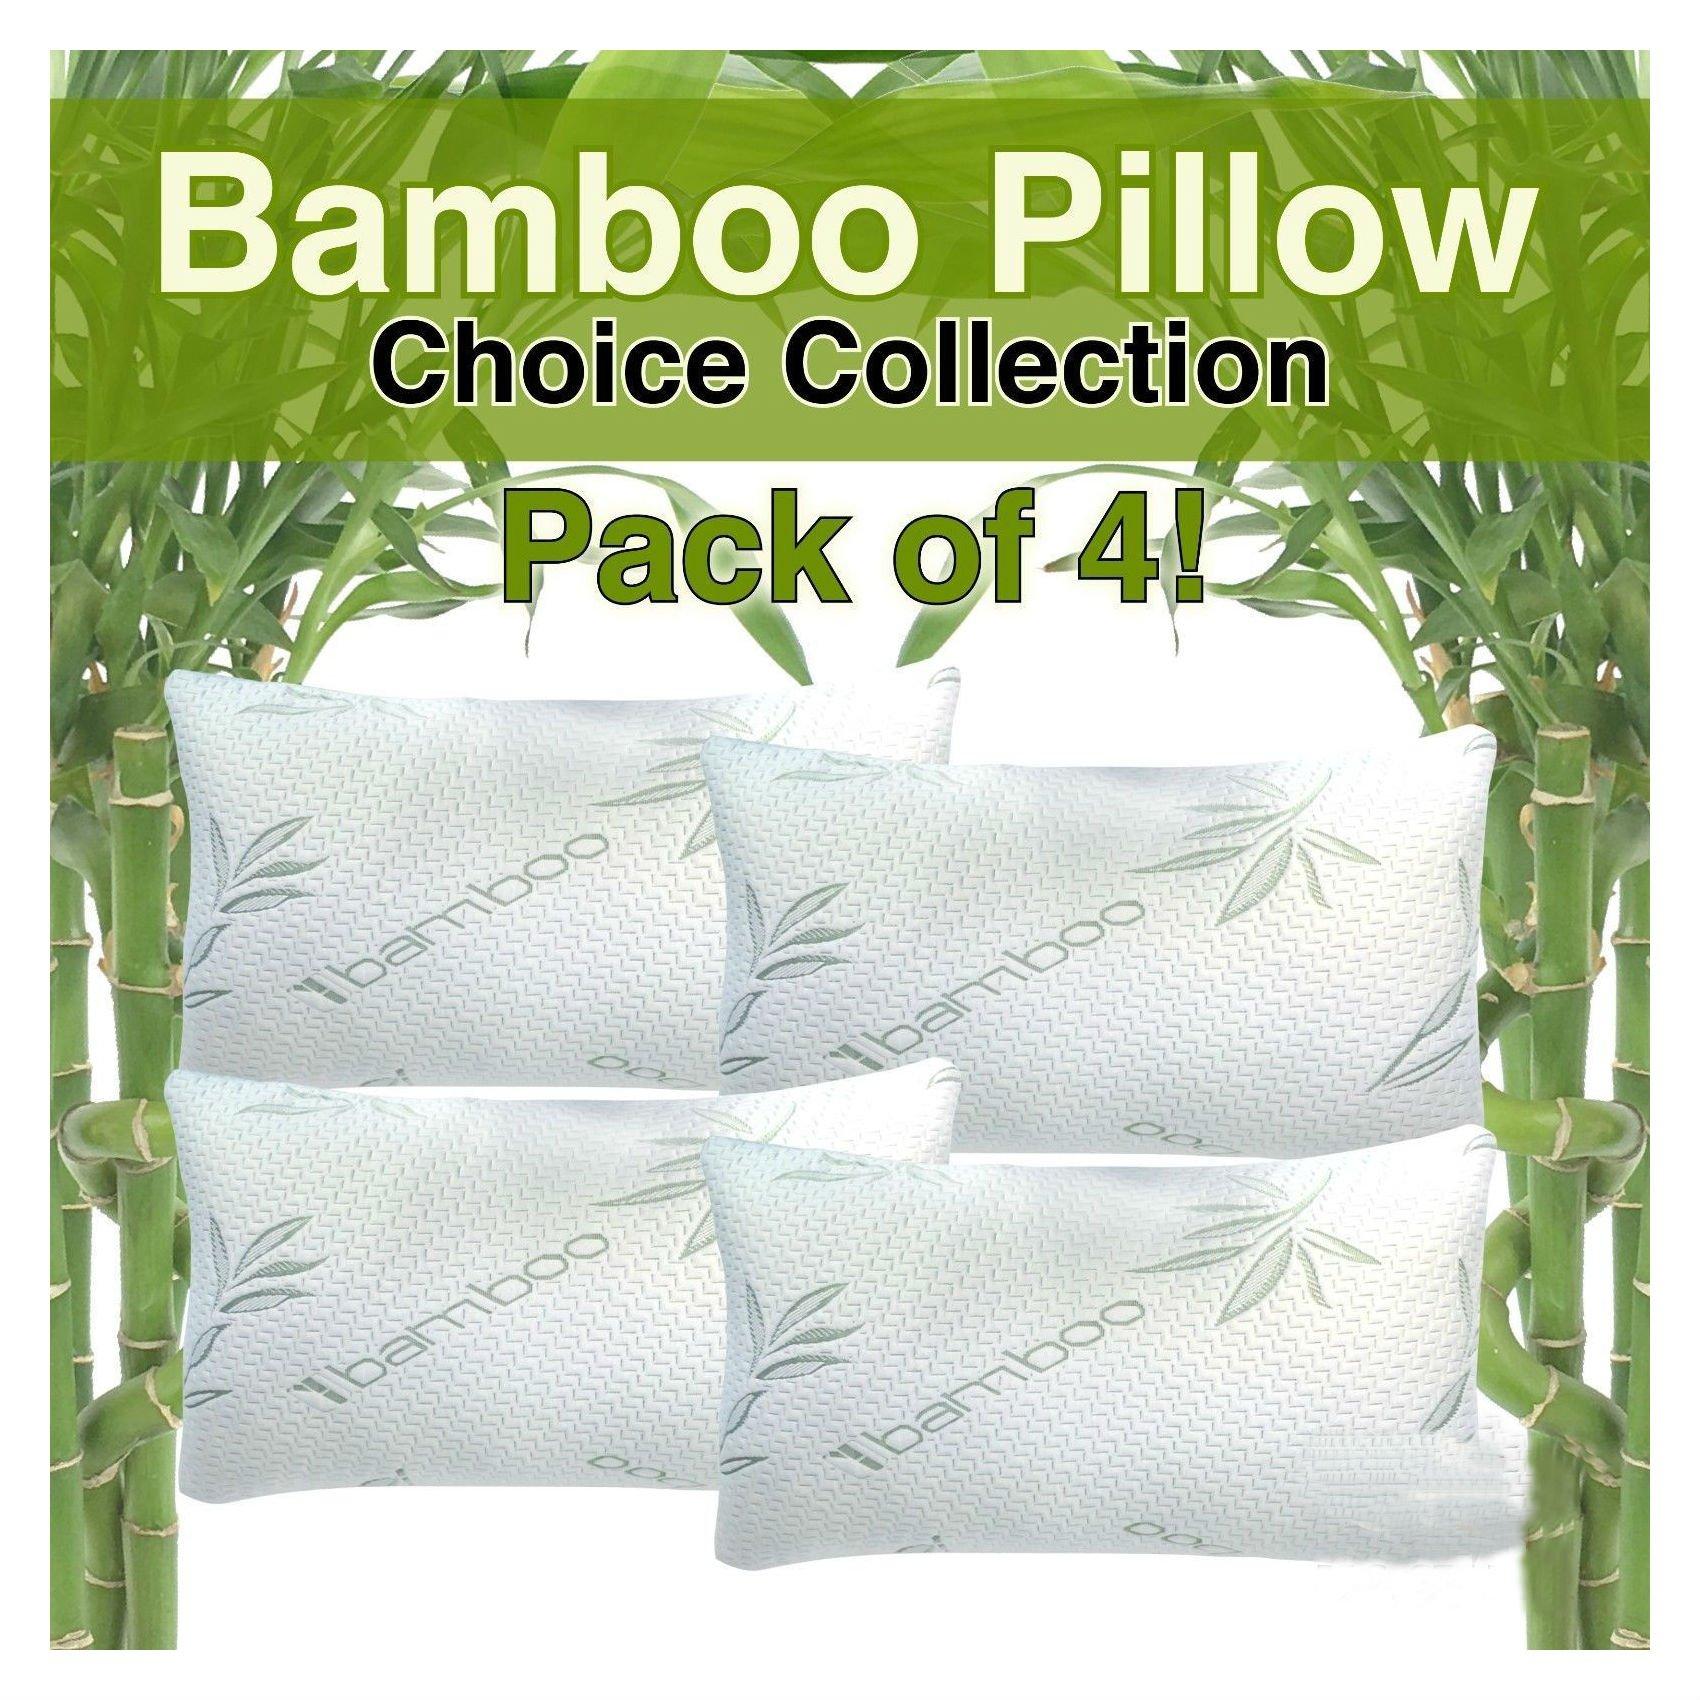 Hotel Comfort Bamboo Foam Pillows - Hypoallergenic - Queen Size Pack of 4